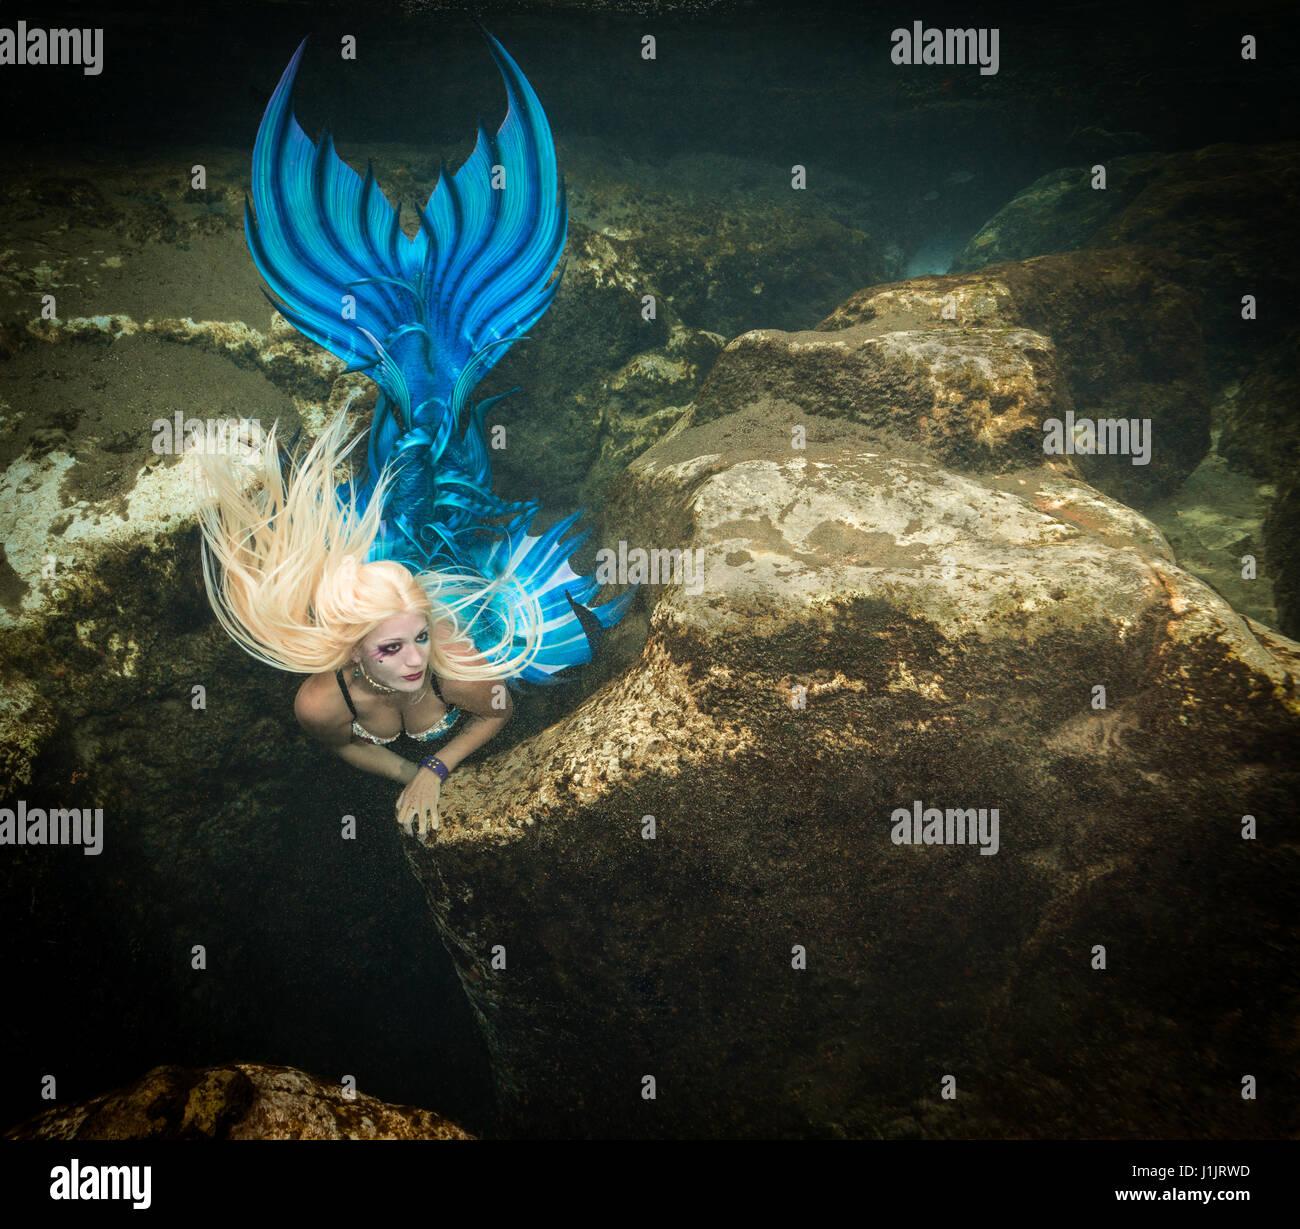 Mermaid in the Salt Springs in Florida, USA - Stock Image